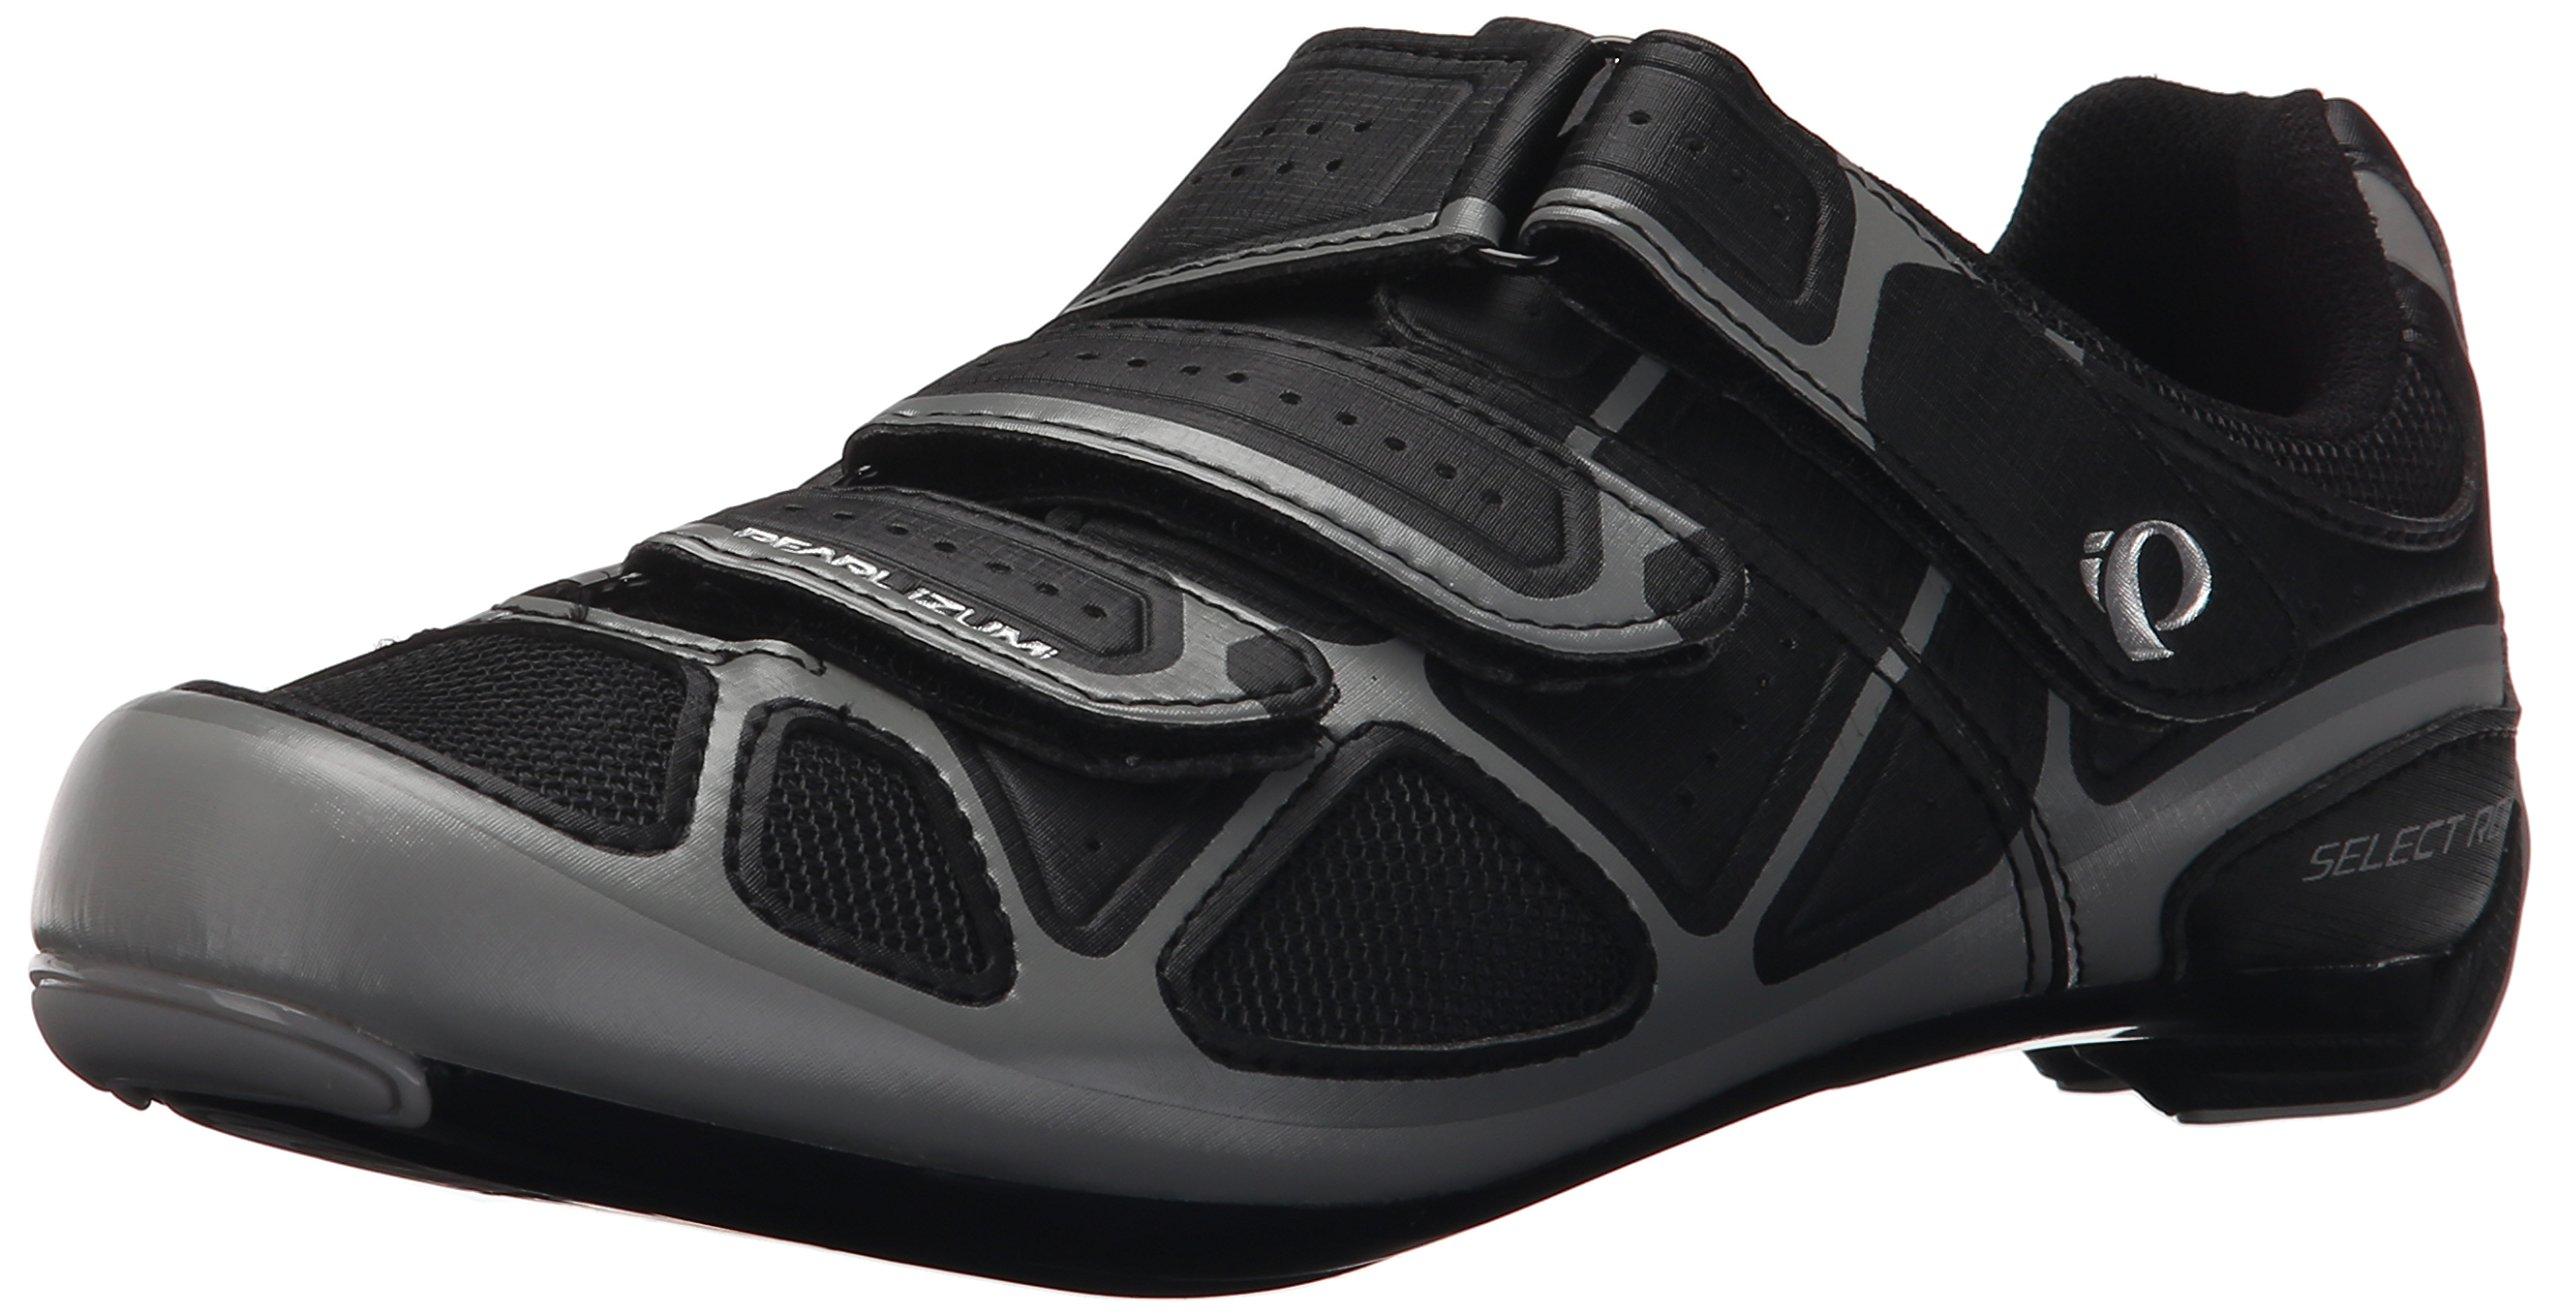 Pearl iZUMi Women's W Select RD IV Cycling Shoe, Black/Black, 37 EU/6 B US